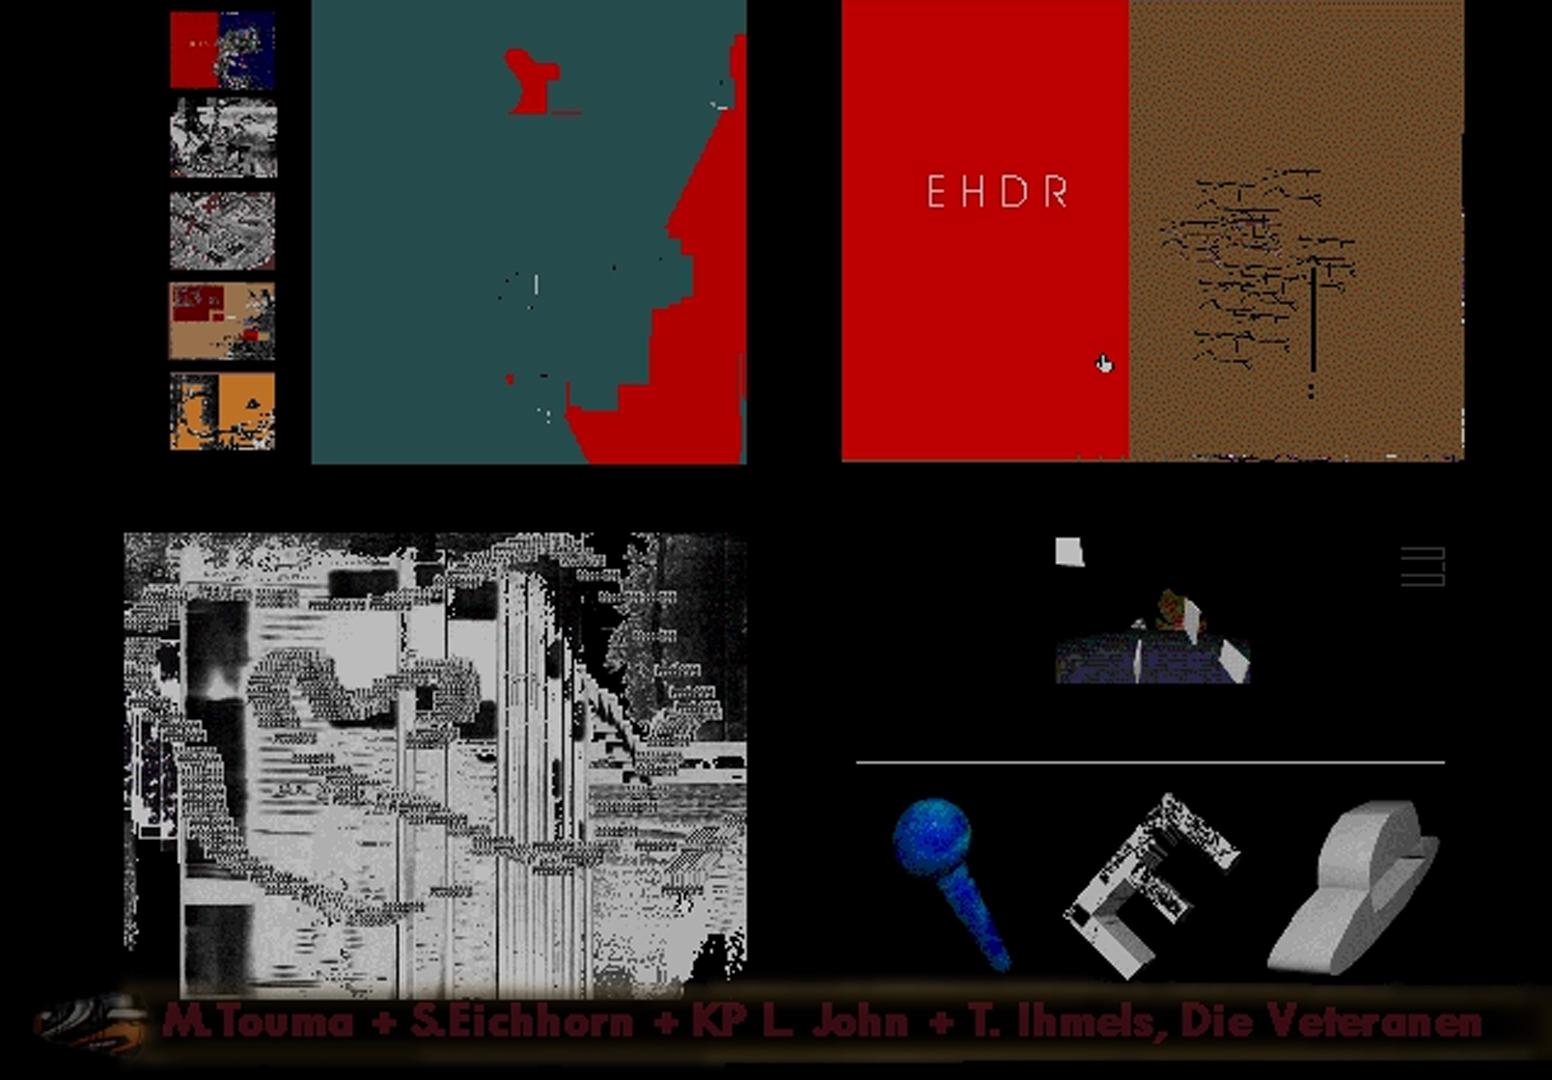 ©, Stephan Eichhorn and K.P. Ludwig John, Die Veteranen: An Art Project for CD-ROM